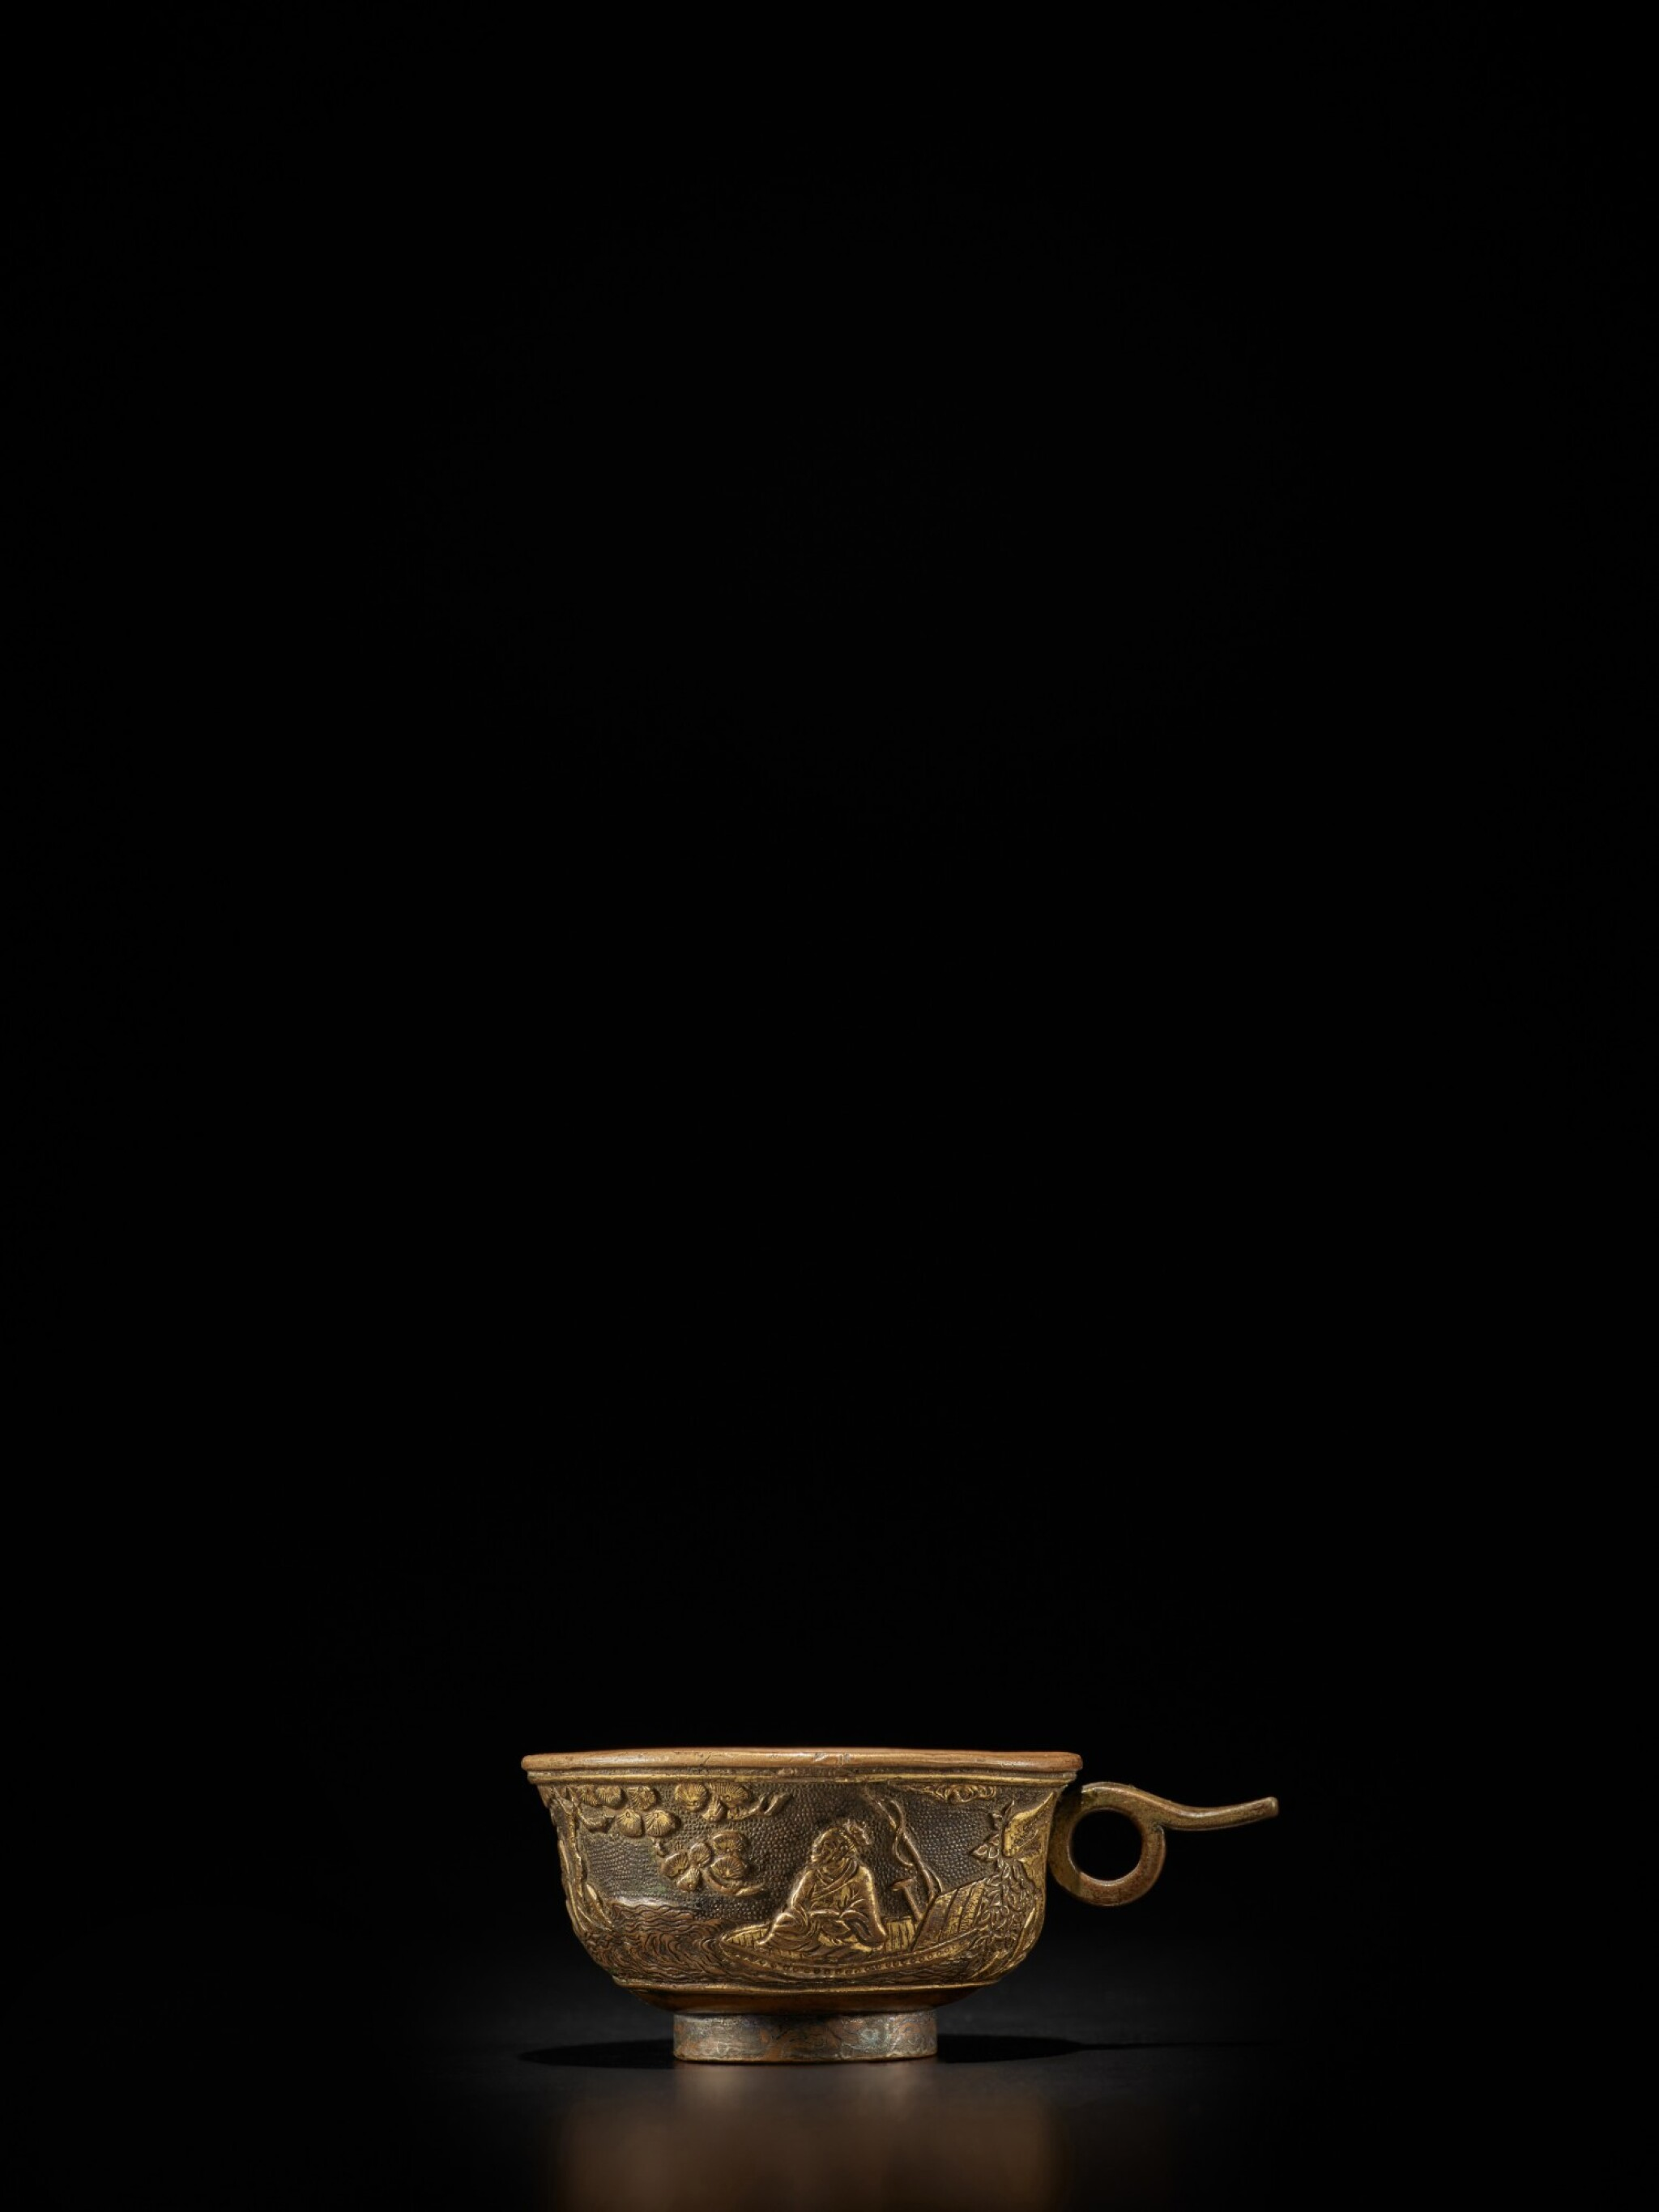 View full screen - View 1 of Lot 124. A small parcel-gilt-bronze cup, Ming dynasty, Wanli period, dated renzi year, corresponding to 1612 | 明萬曆壬子年(1612年) 銅局部鎏金松下高士圖小盃 《萬曆壬子》款.